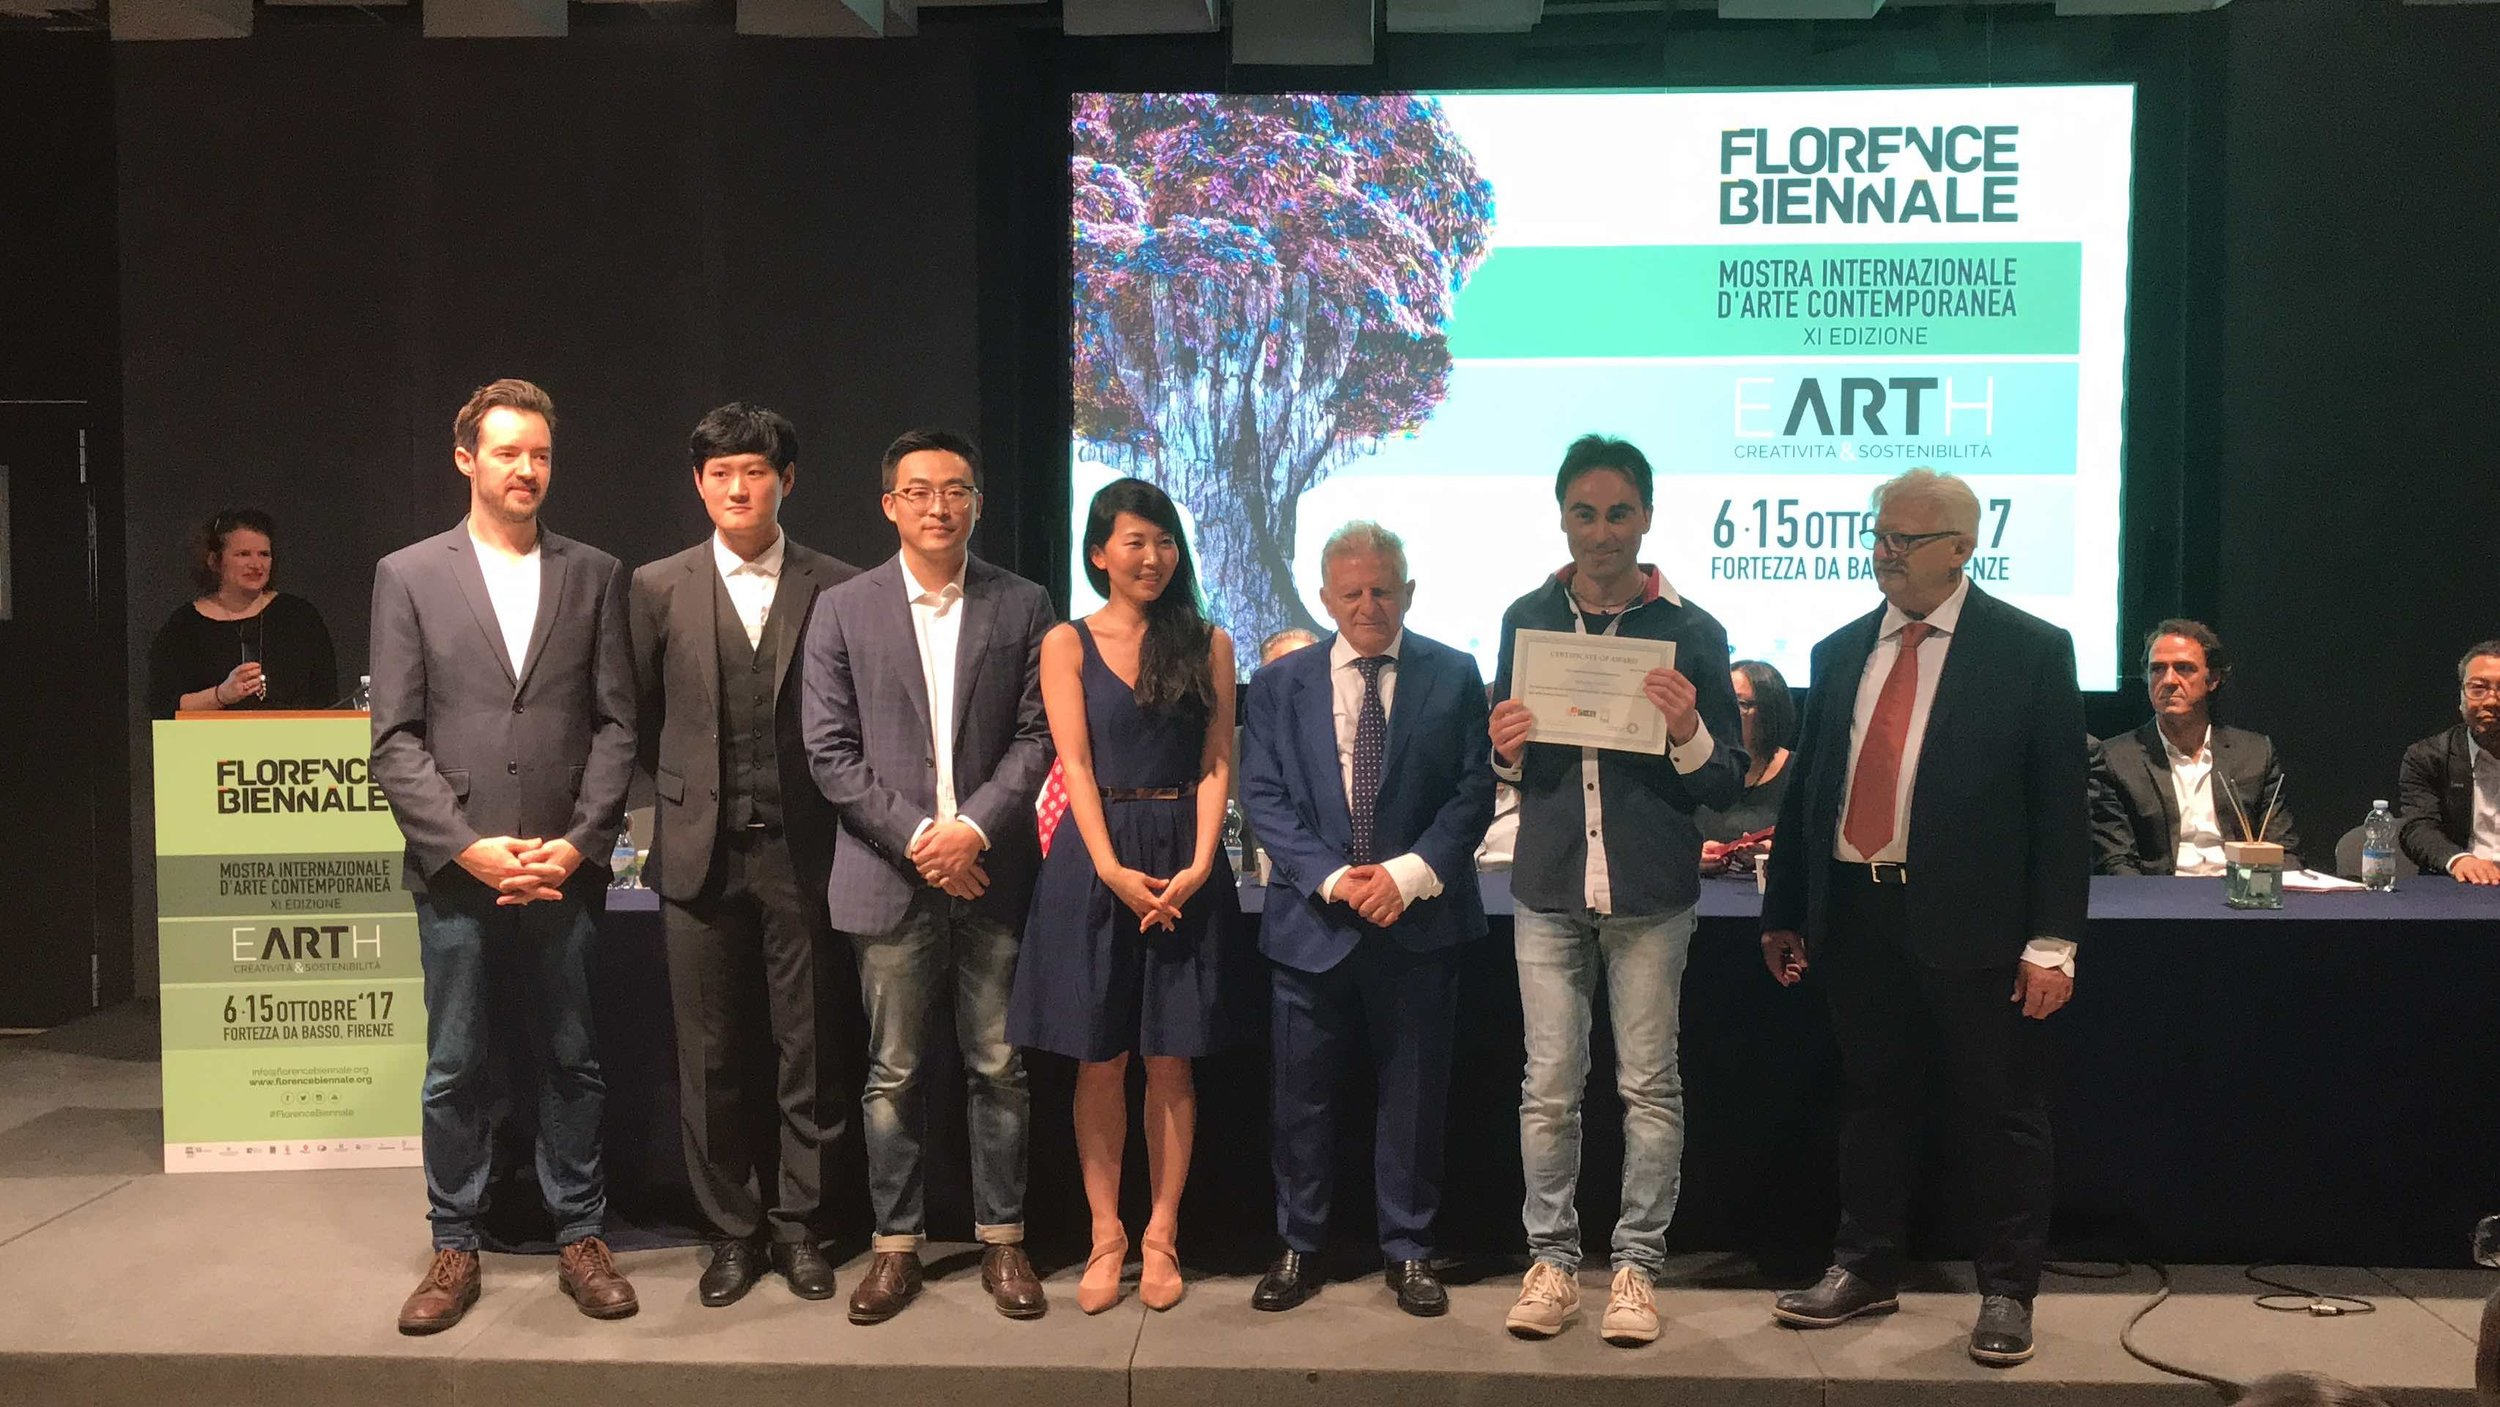 Antonio Saluzzi receiving his award at the Florence Biennale